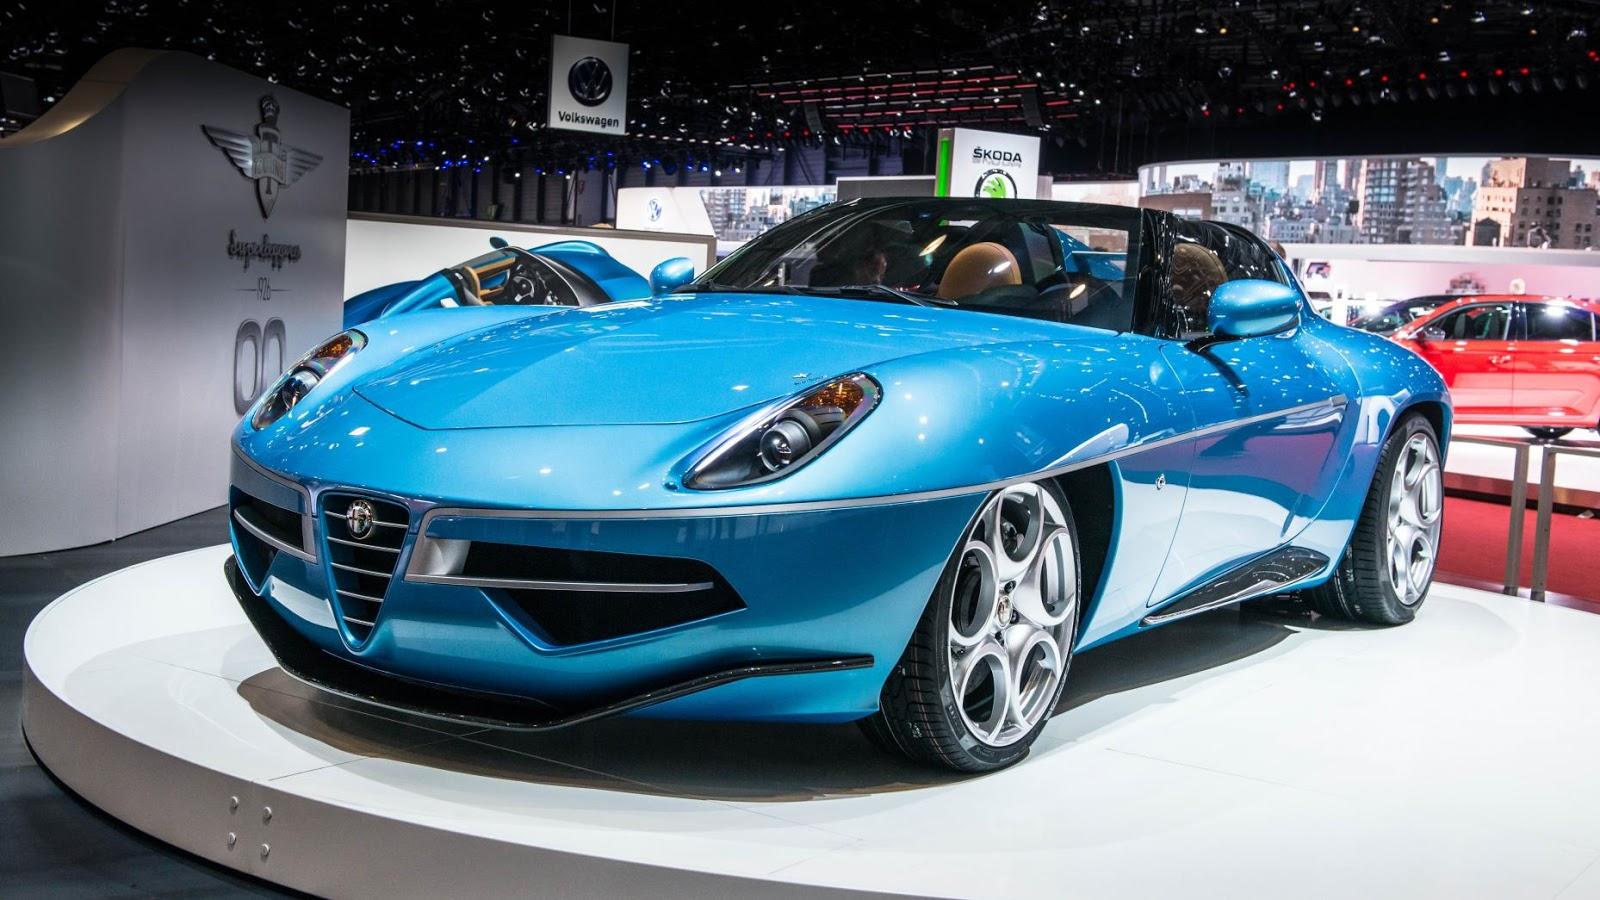 Alfa Disco Volante Spyder